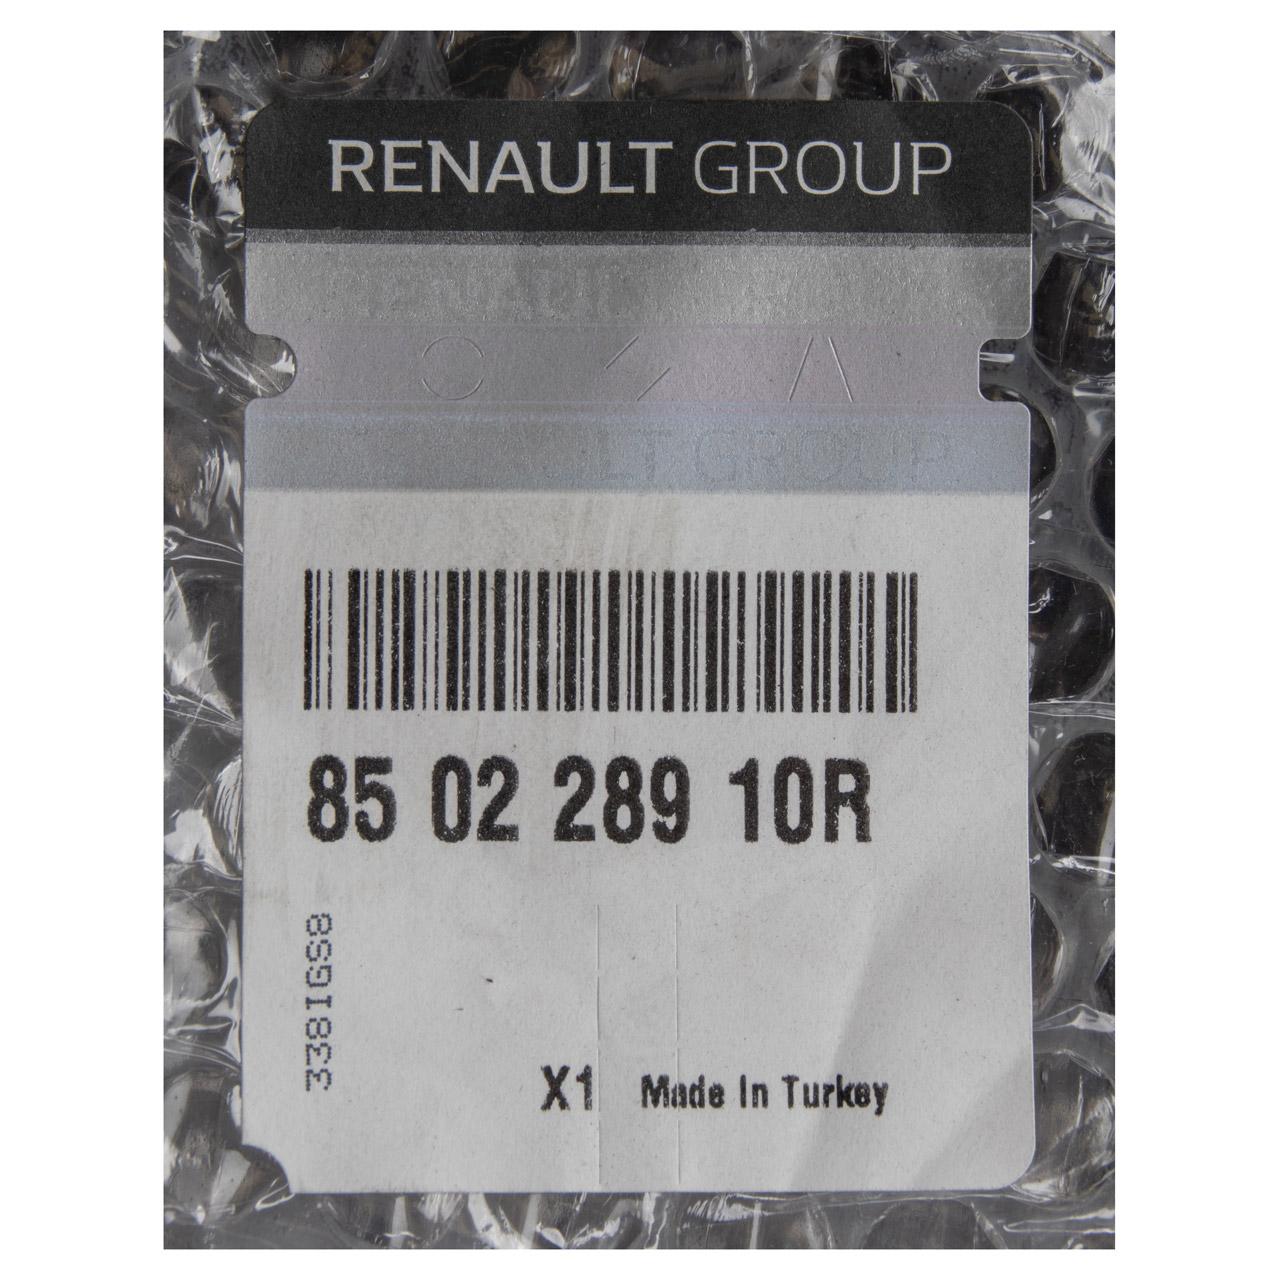 ORIGINAL Renault Stoßstange Heckstoßstange CLIO IV Grandtour (KH_) 850228910R